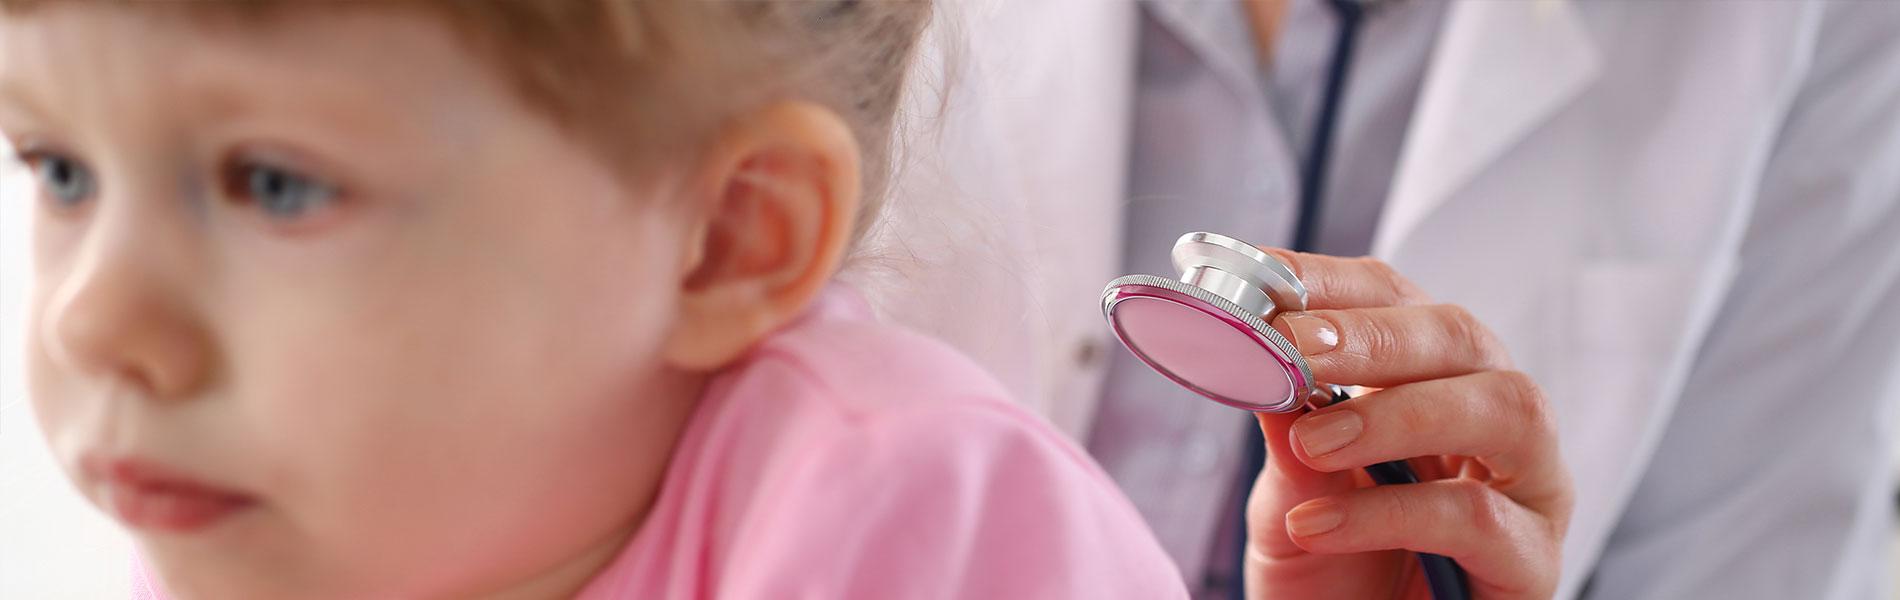 Pediatric Palliative Care Training